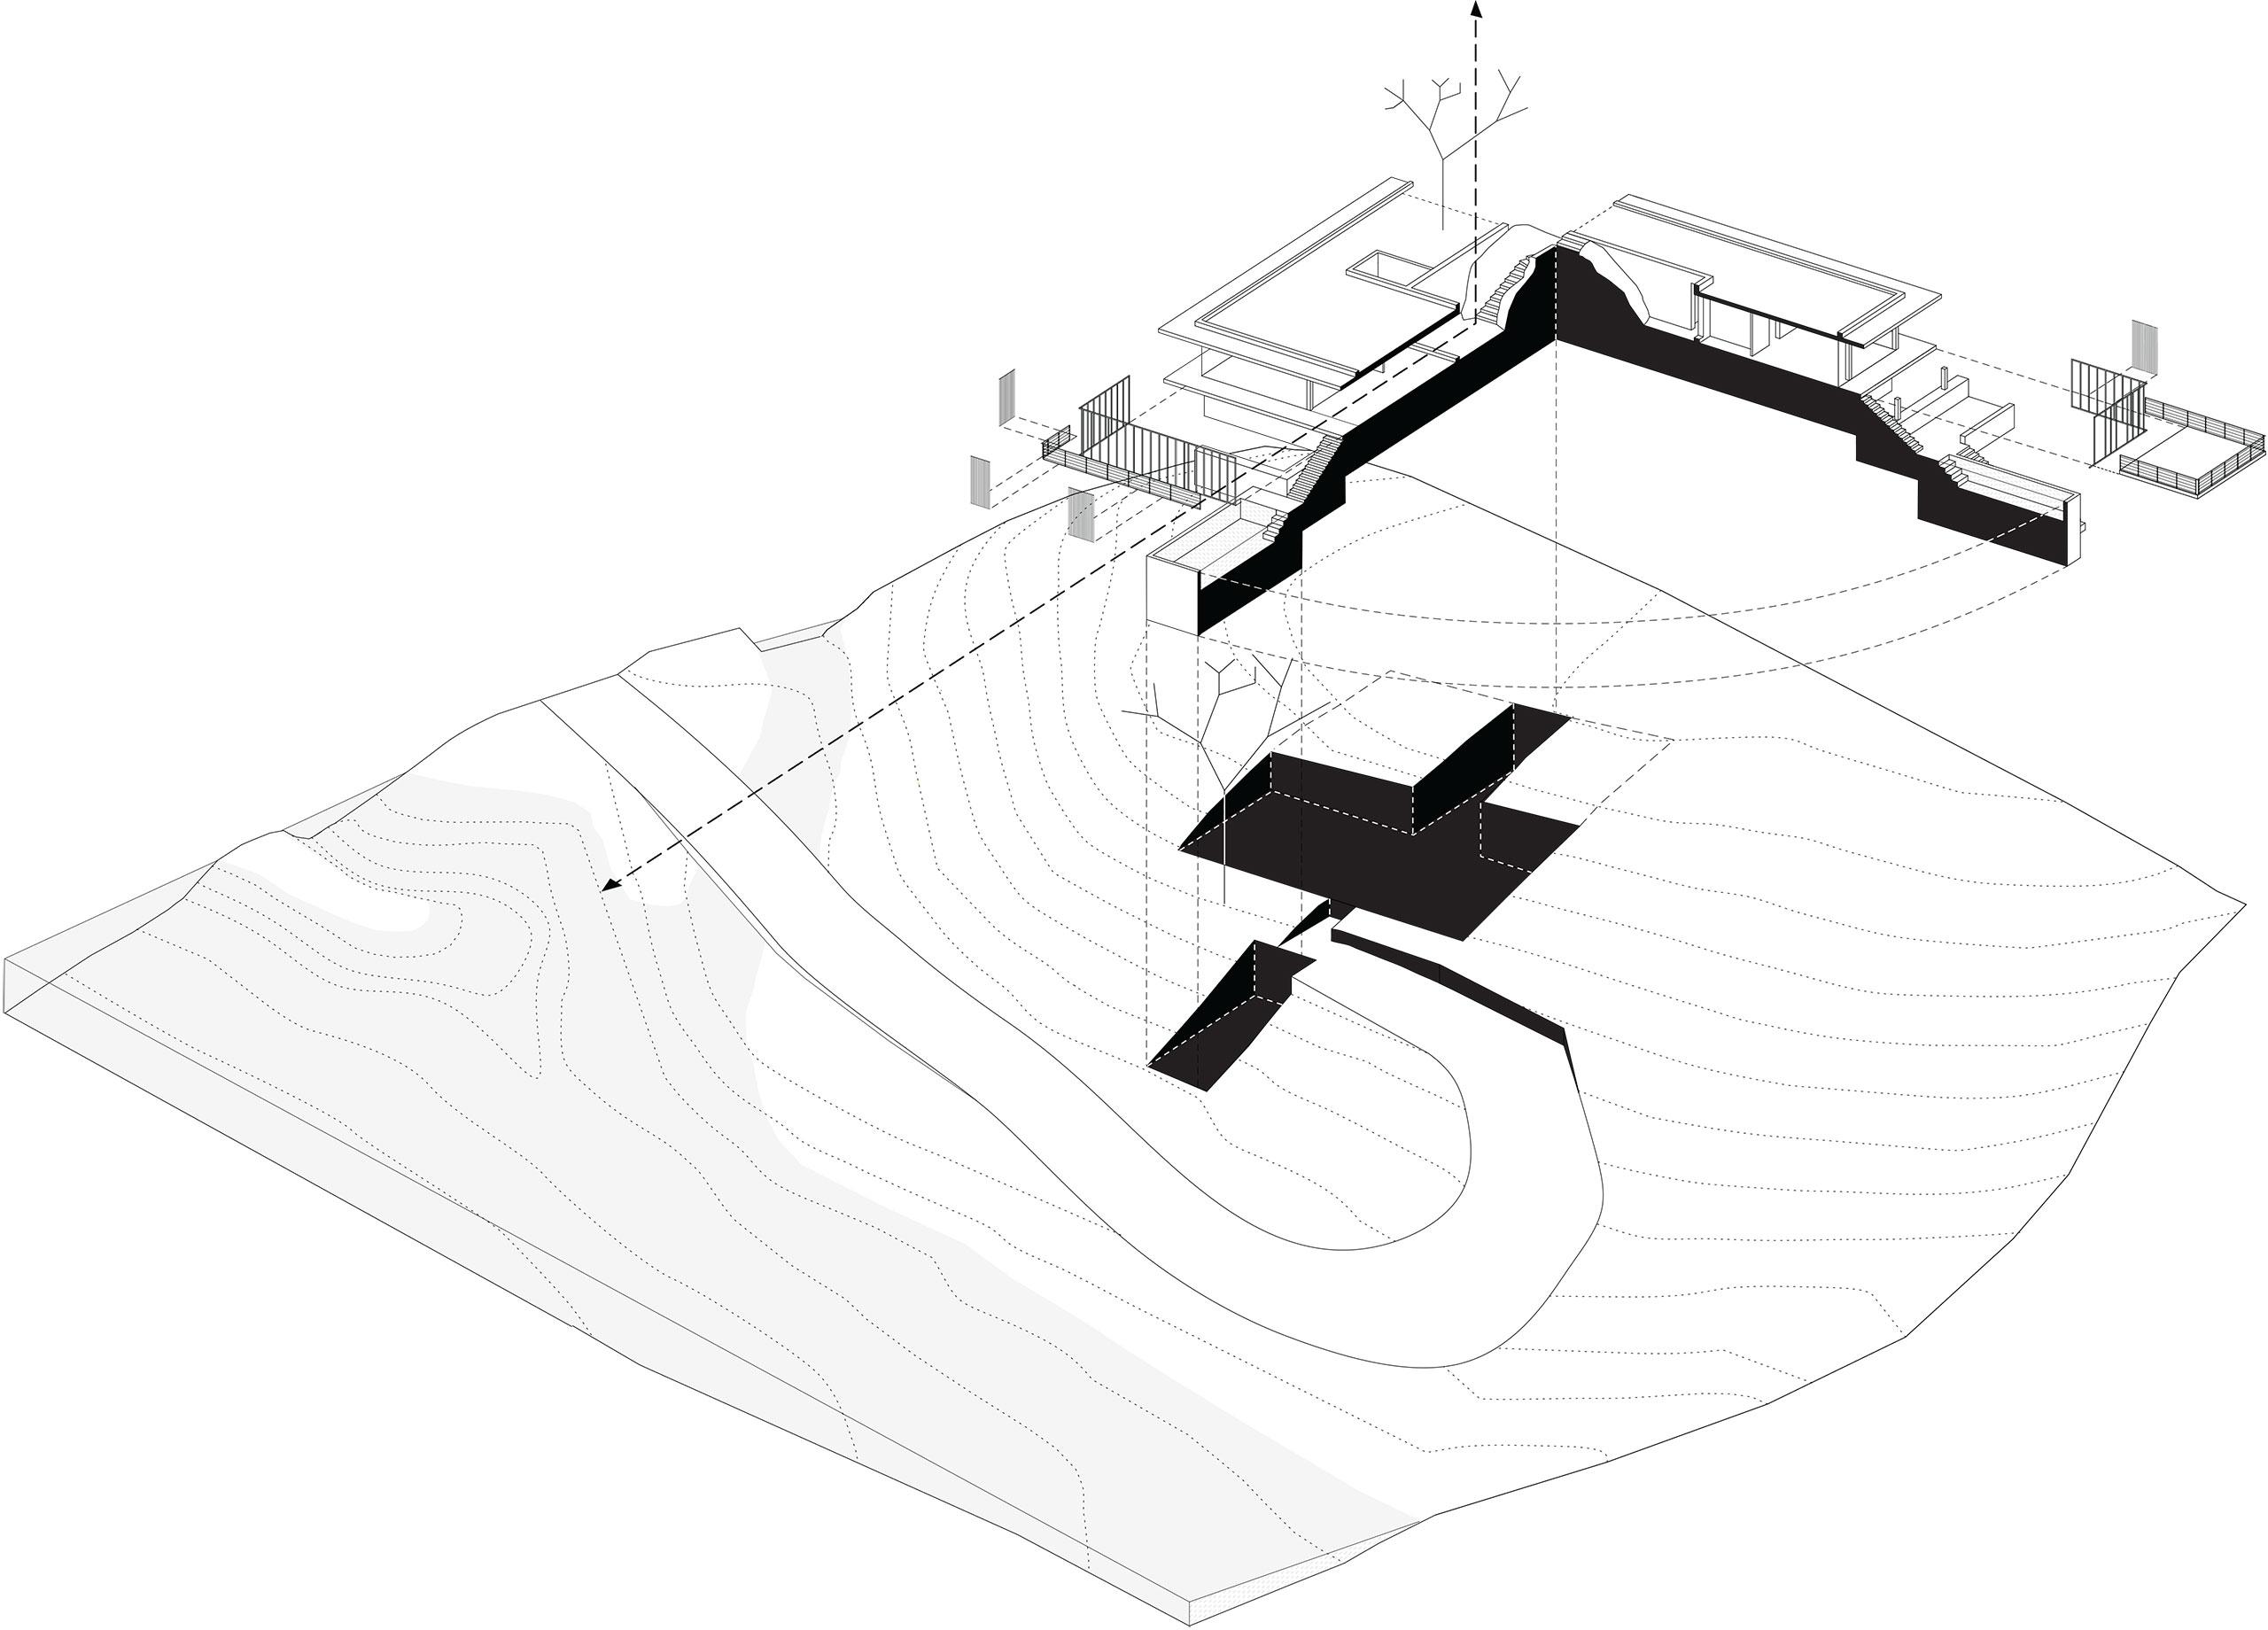 Riparian House sectional axonometric